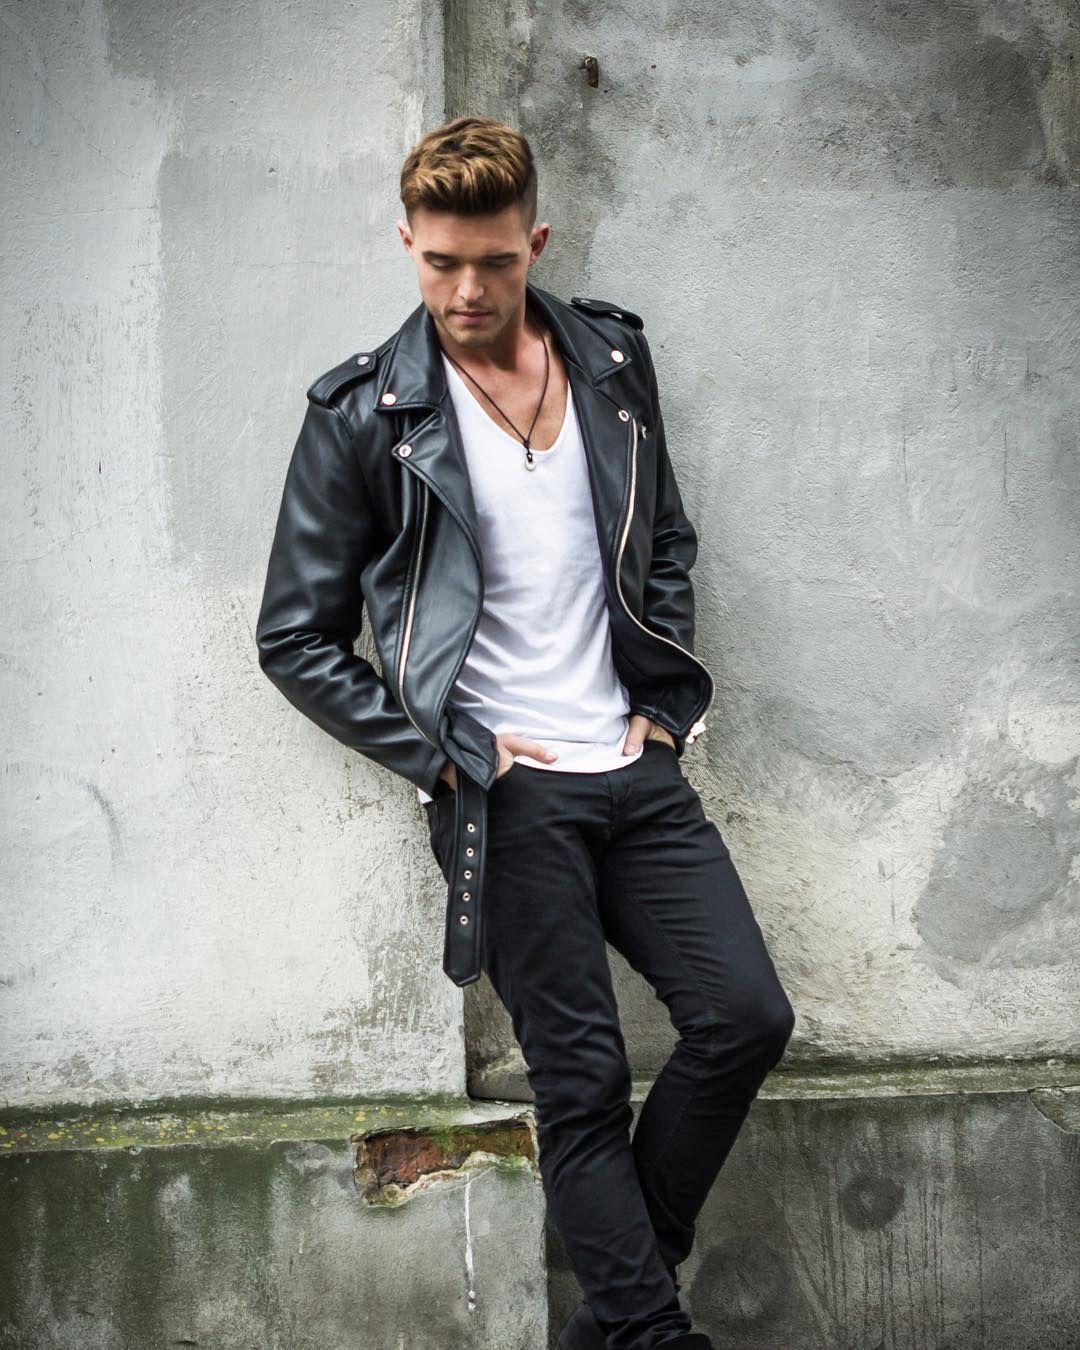 Rock N Roll Mood How Do You Like It Styleoftheday Menswear Mensfas Leather Jacket Men Style Leather Jacket Street Style Leather Jacket Outfit Men [ 1350 x 1080 Pixel ]